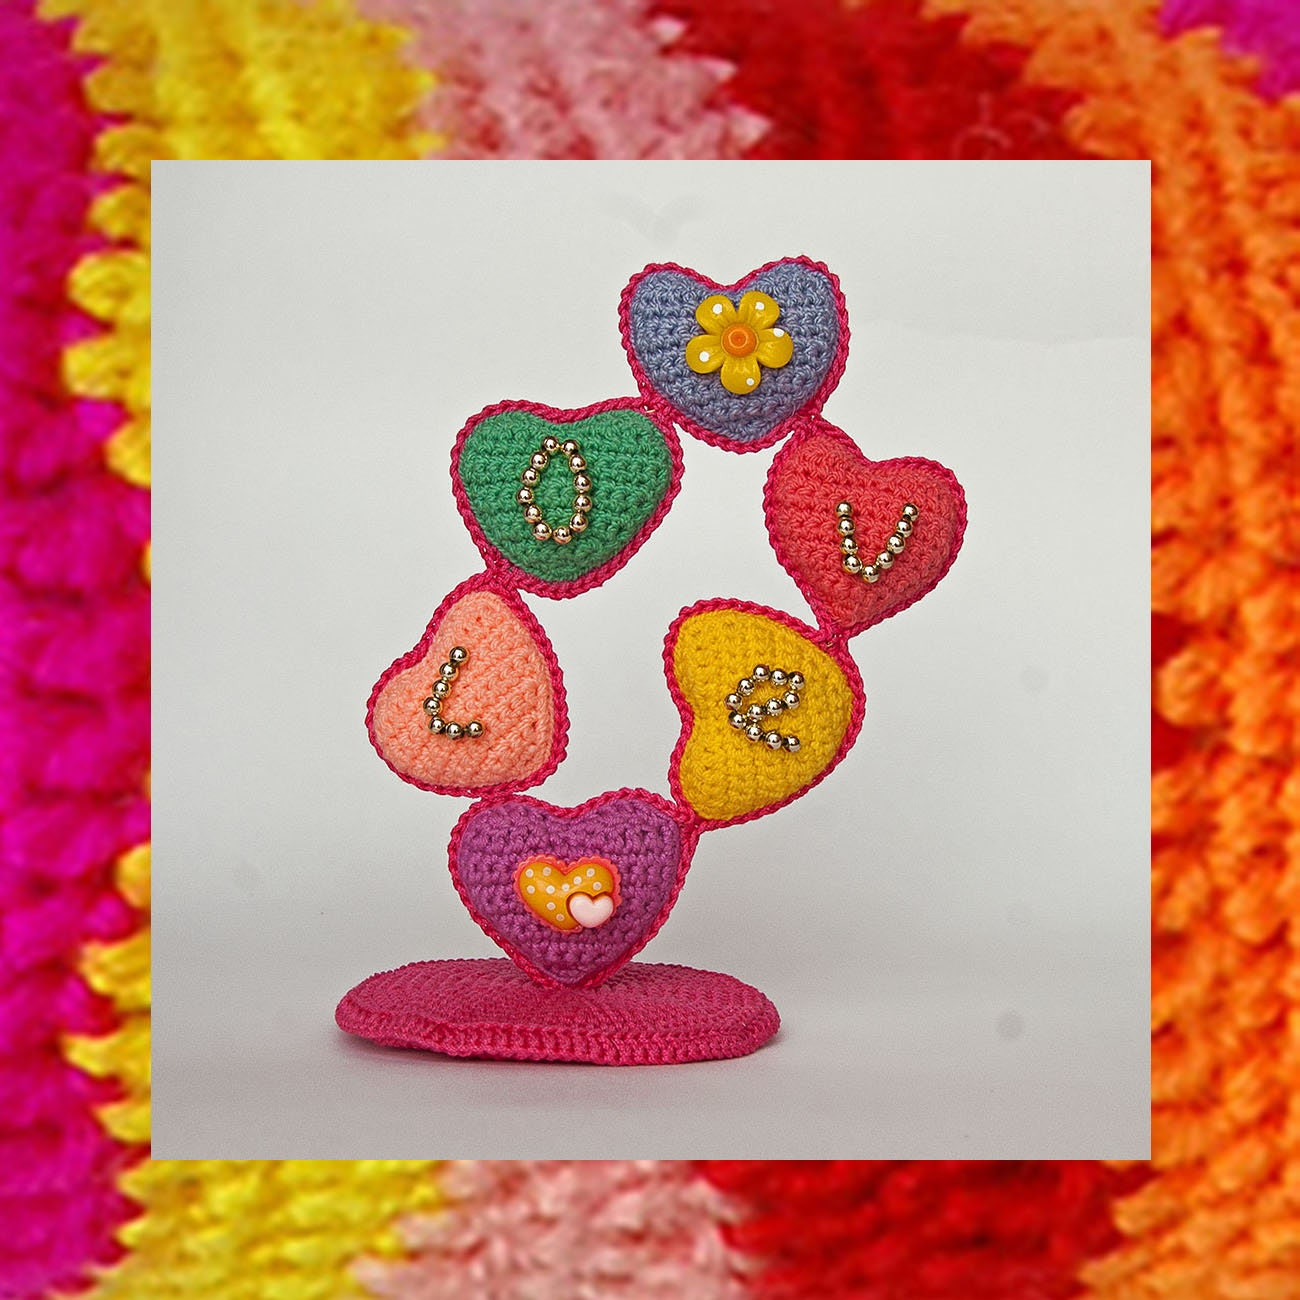 047 Crochet Heart Pattern Amigurumi Heart Tree Amigurumi Etsy